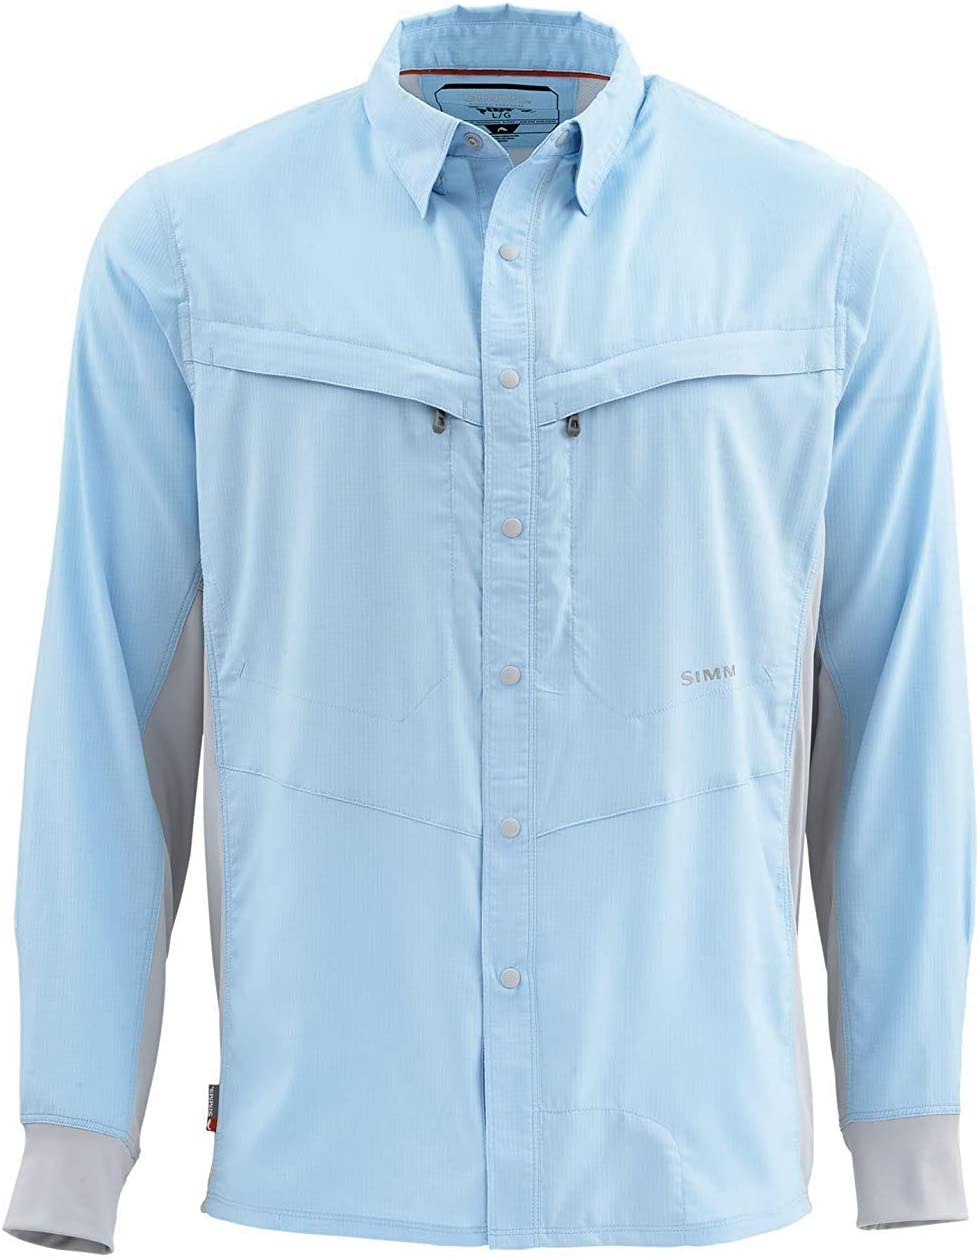 Simms Intruder Bicomp Shirt Light 青 シムス イントルーダー バイコンプ シャツ  M [並行輸入品]